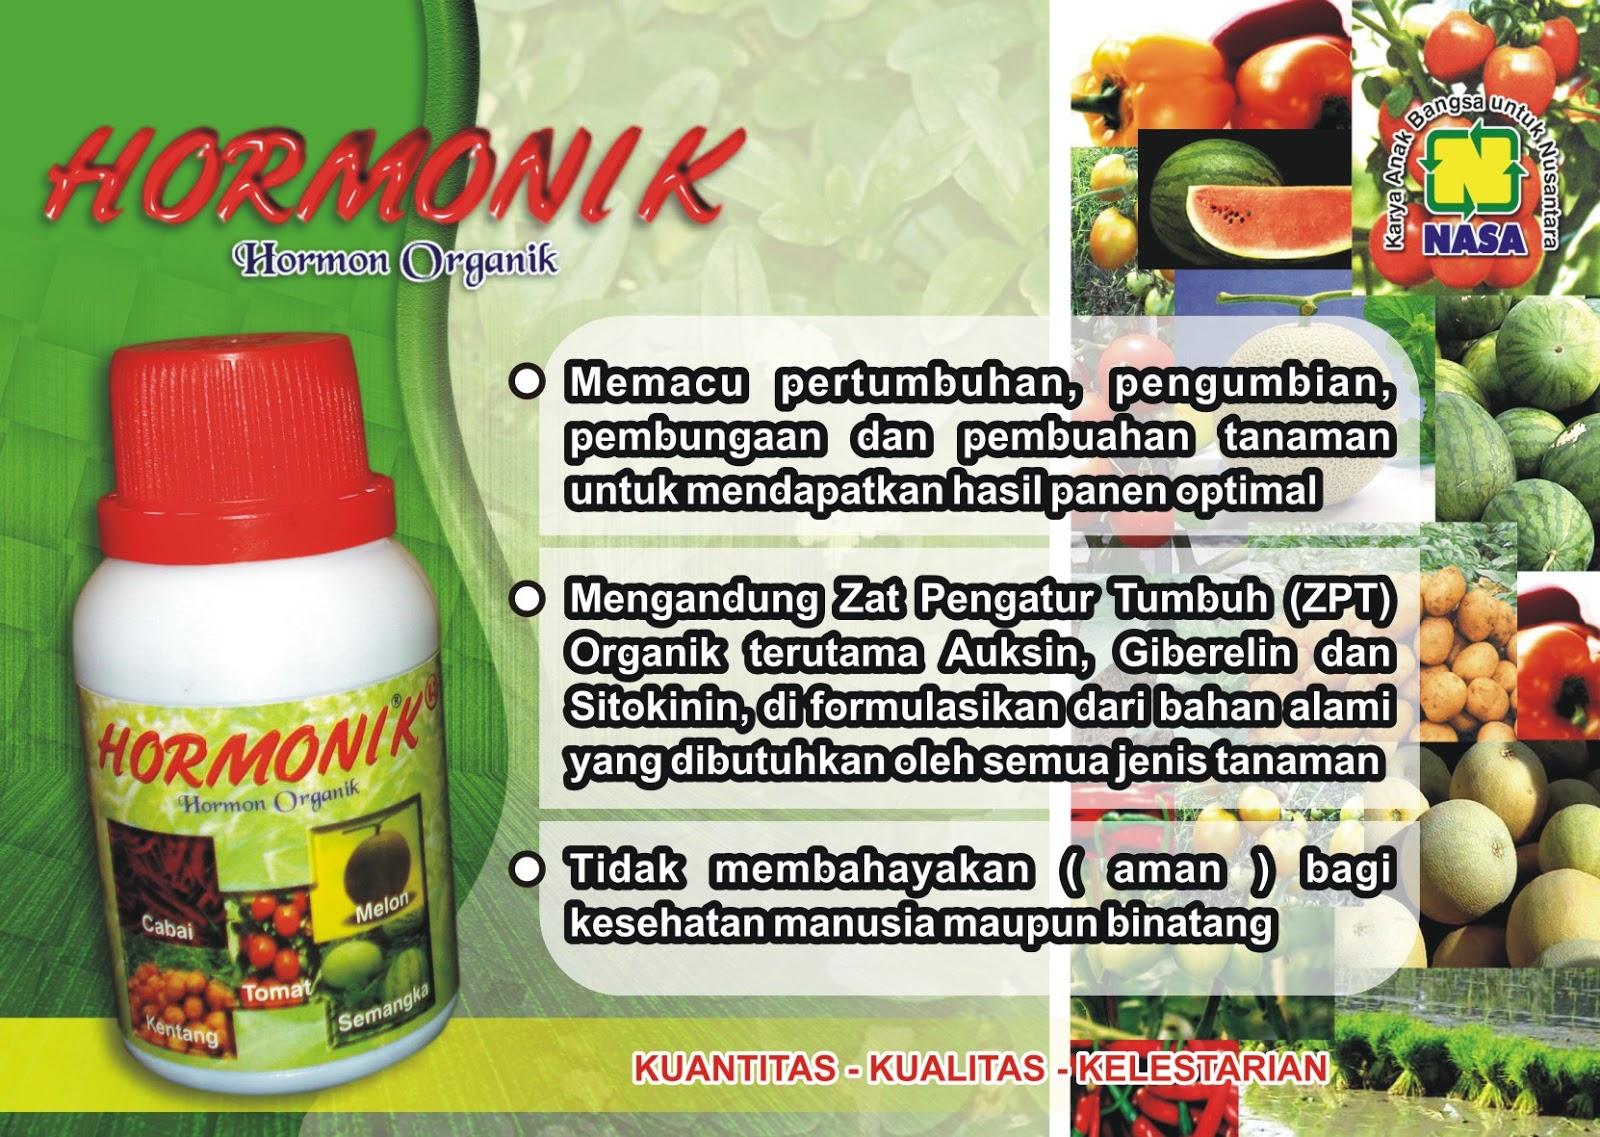 Hormonik Stockist Center Ae249 Nasa Madiun Ska 72 Serbuk Kedelai Alami Organik